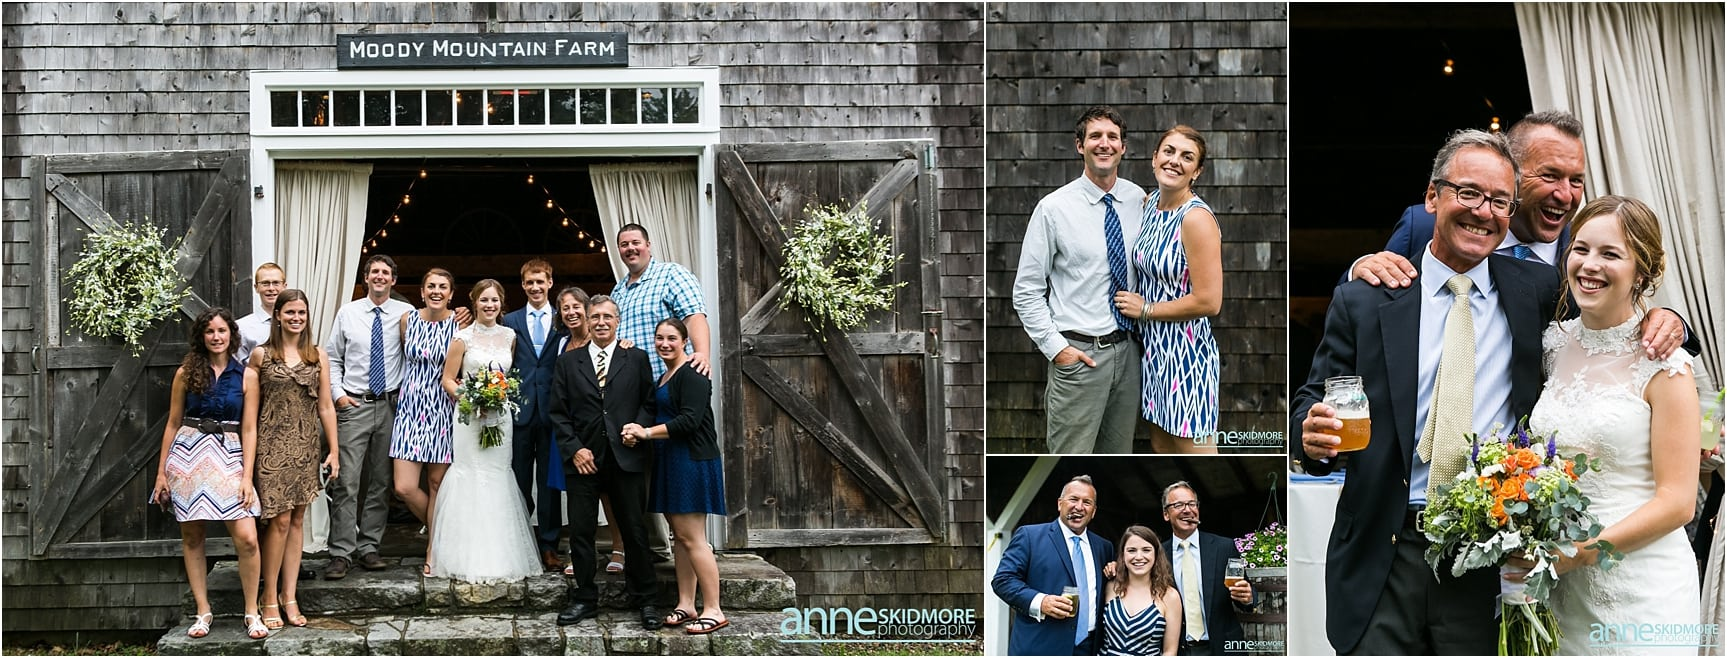 moody_mountain_farm_wedding__058